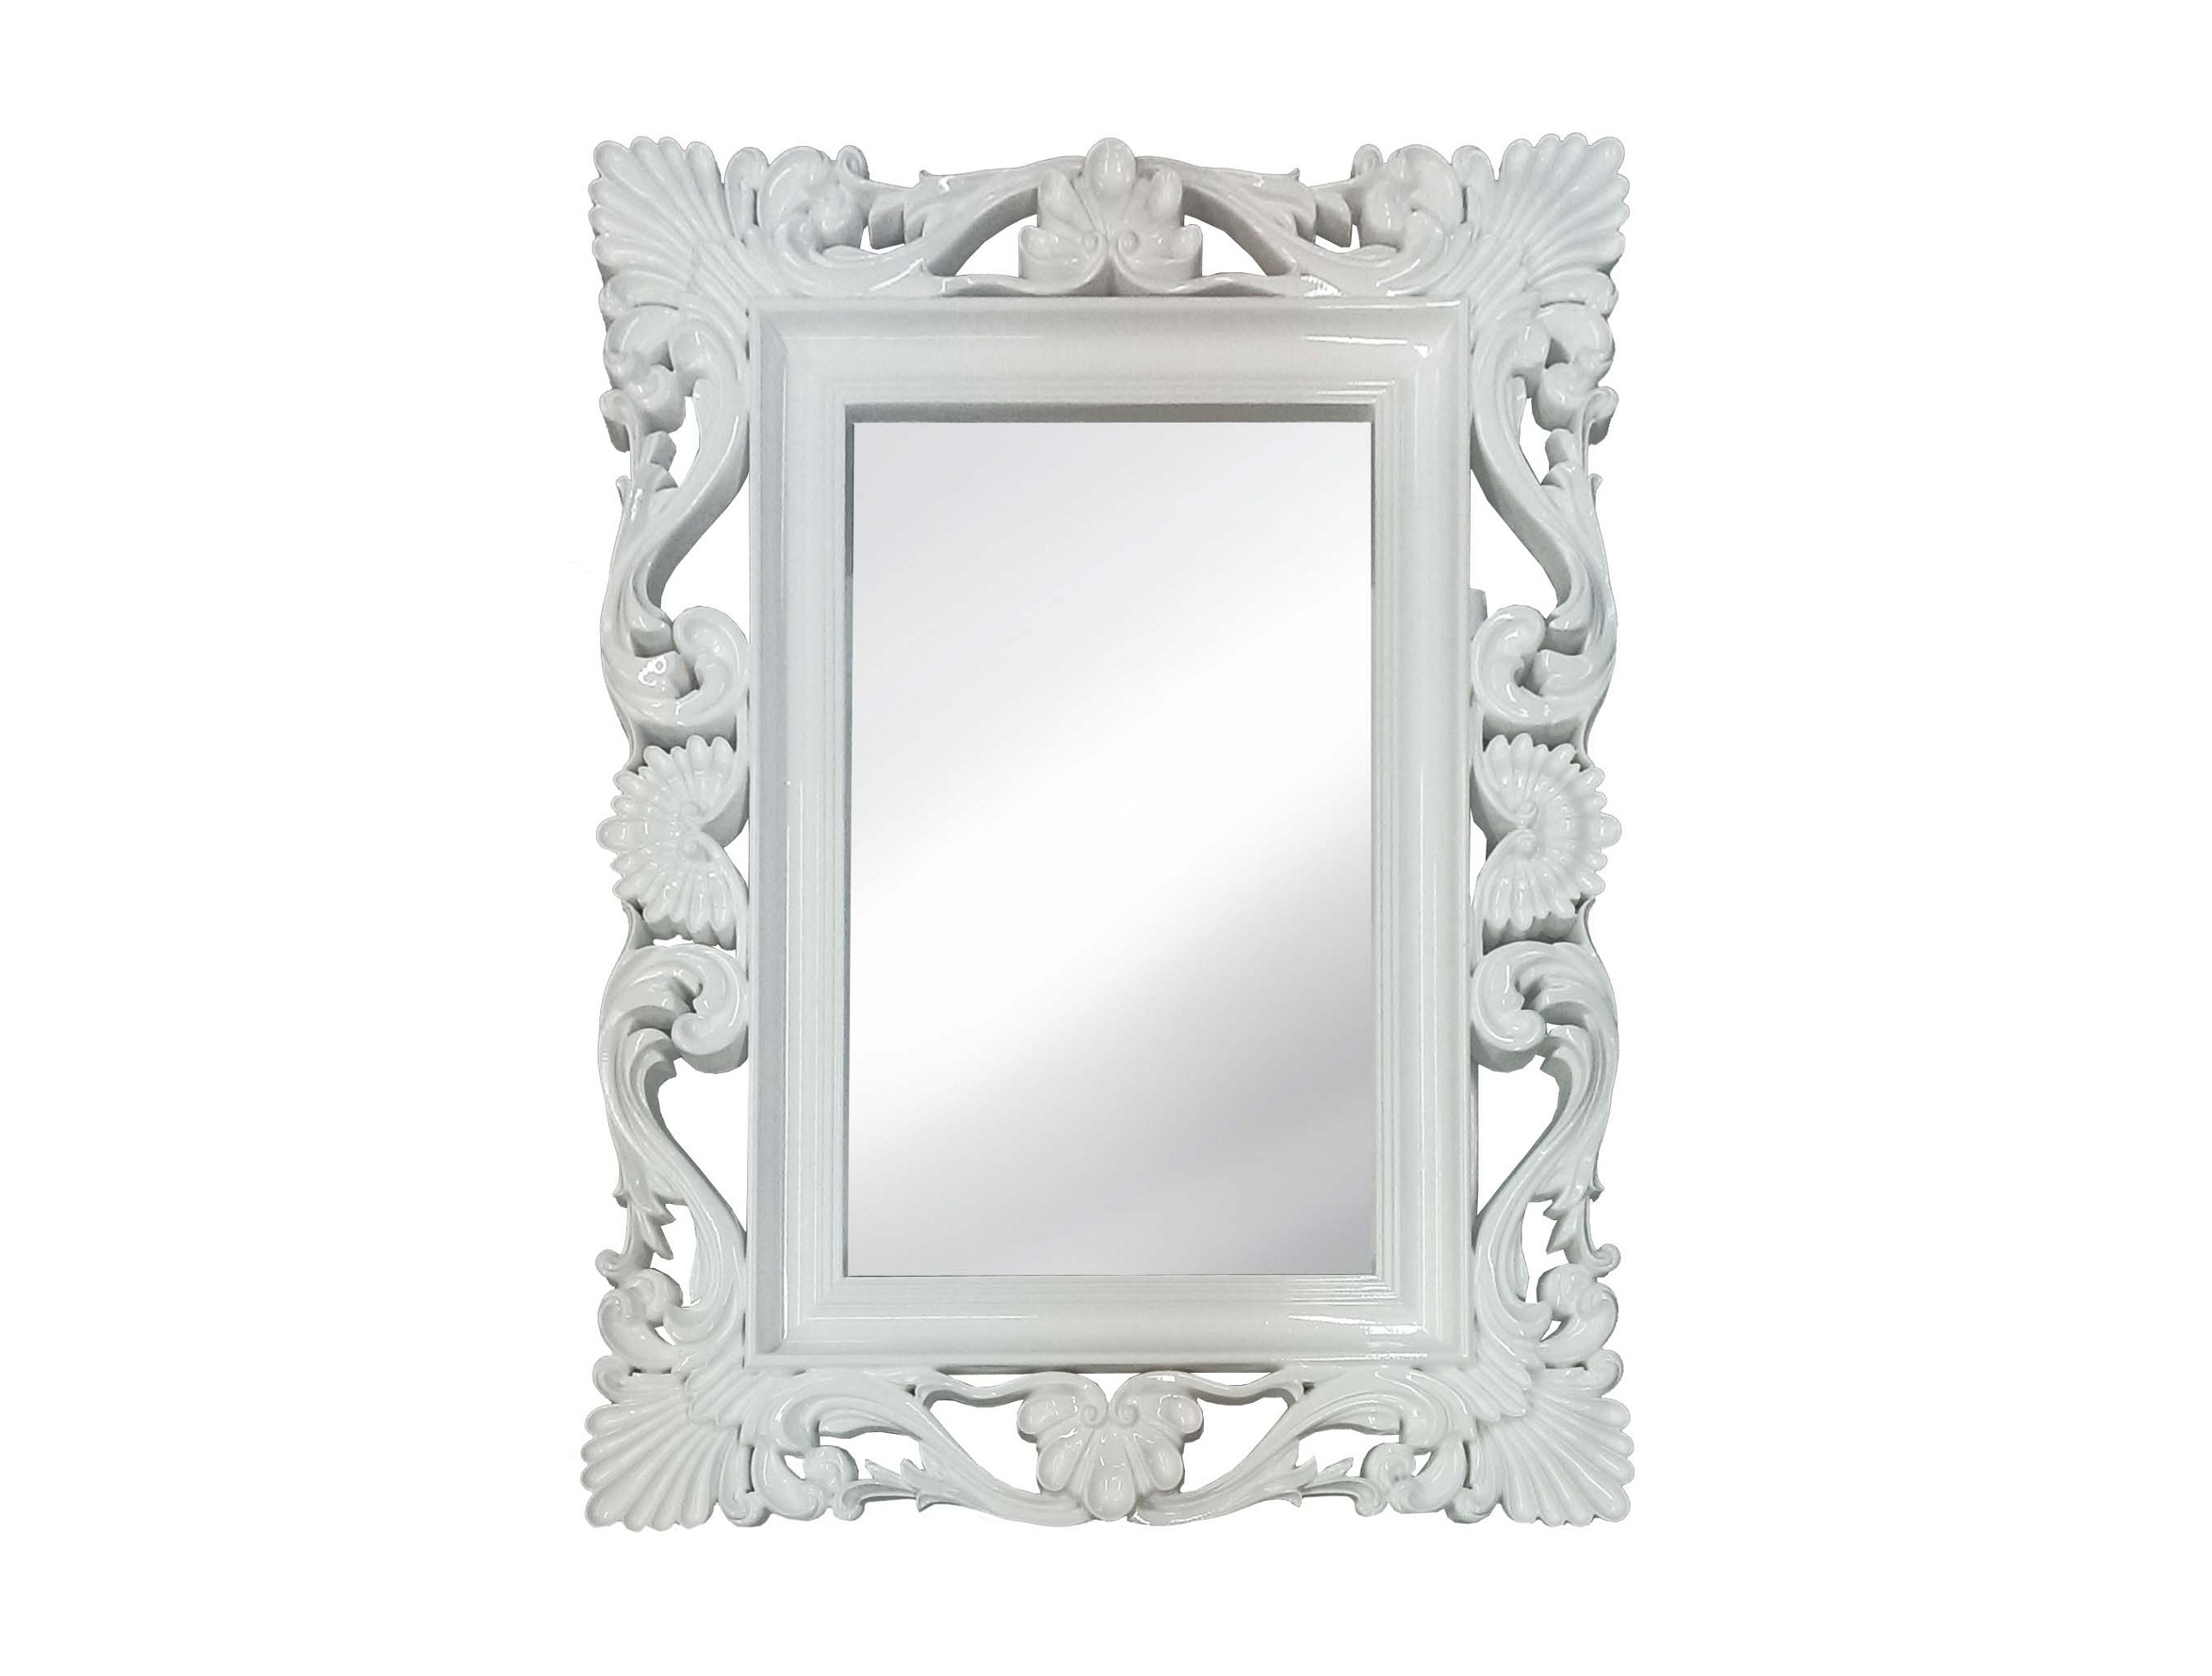 Зеркало АльбериоНастенные зеркала<br><br><br>Material: Пластик<br>Length см: None<br>Width см: 86<br>Depth см: 4<br>Height см: 114